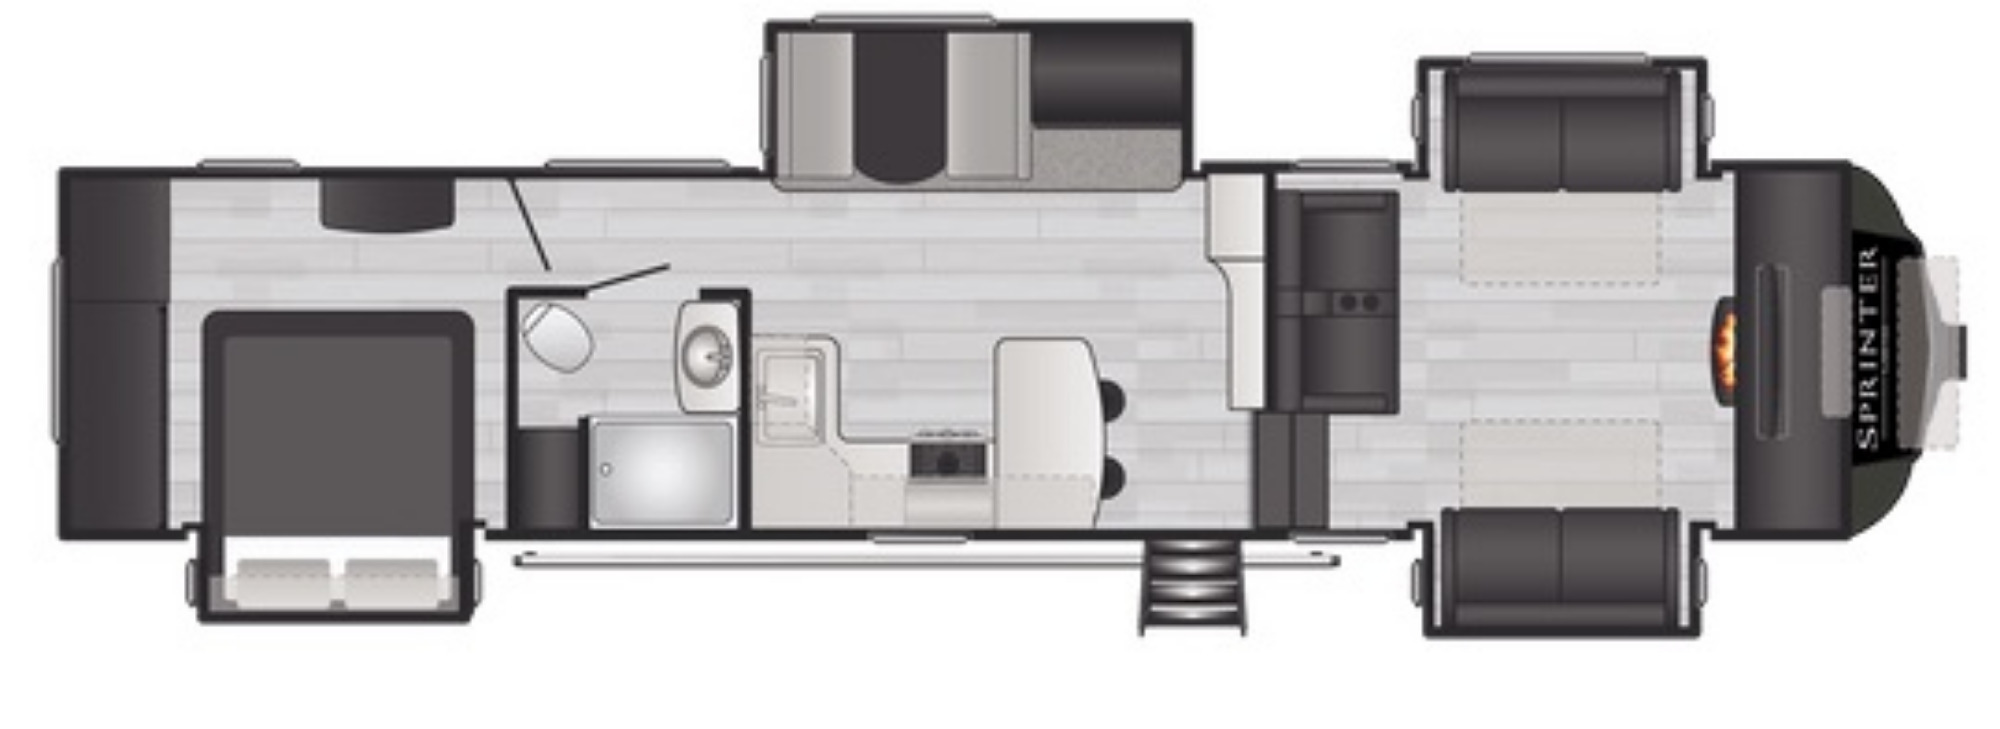 View Floor Plan for 2021 KEYSTONE SPRINTER LIMITED 3670FLS